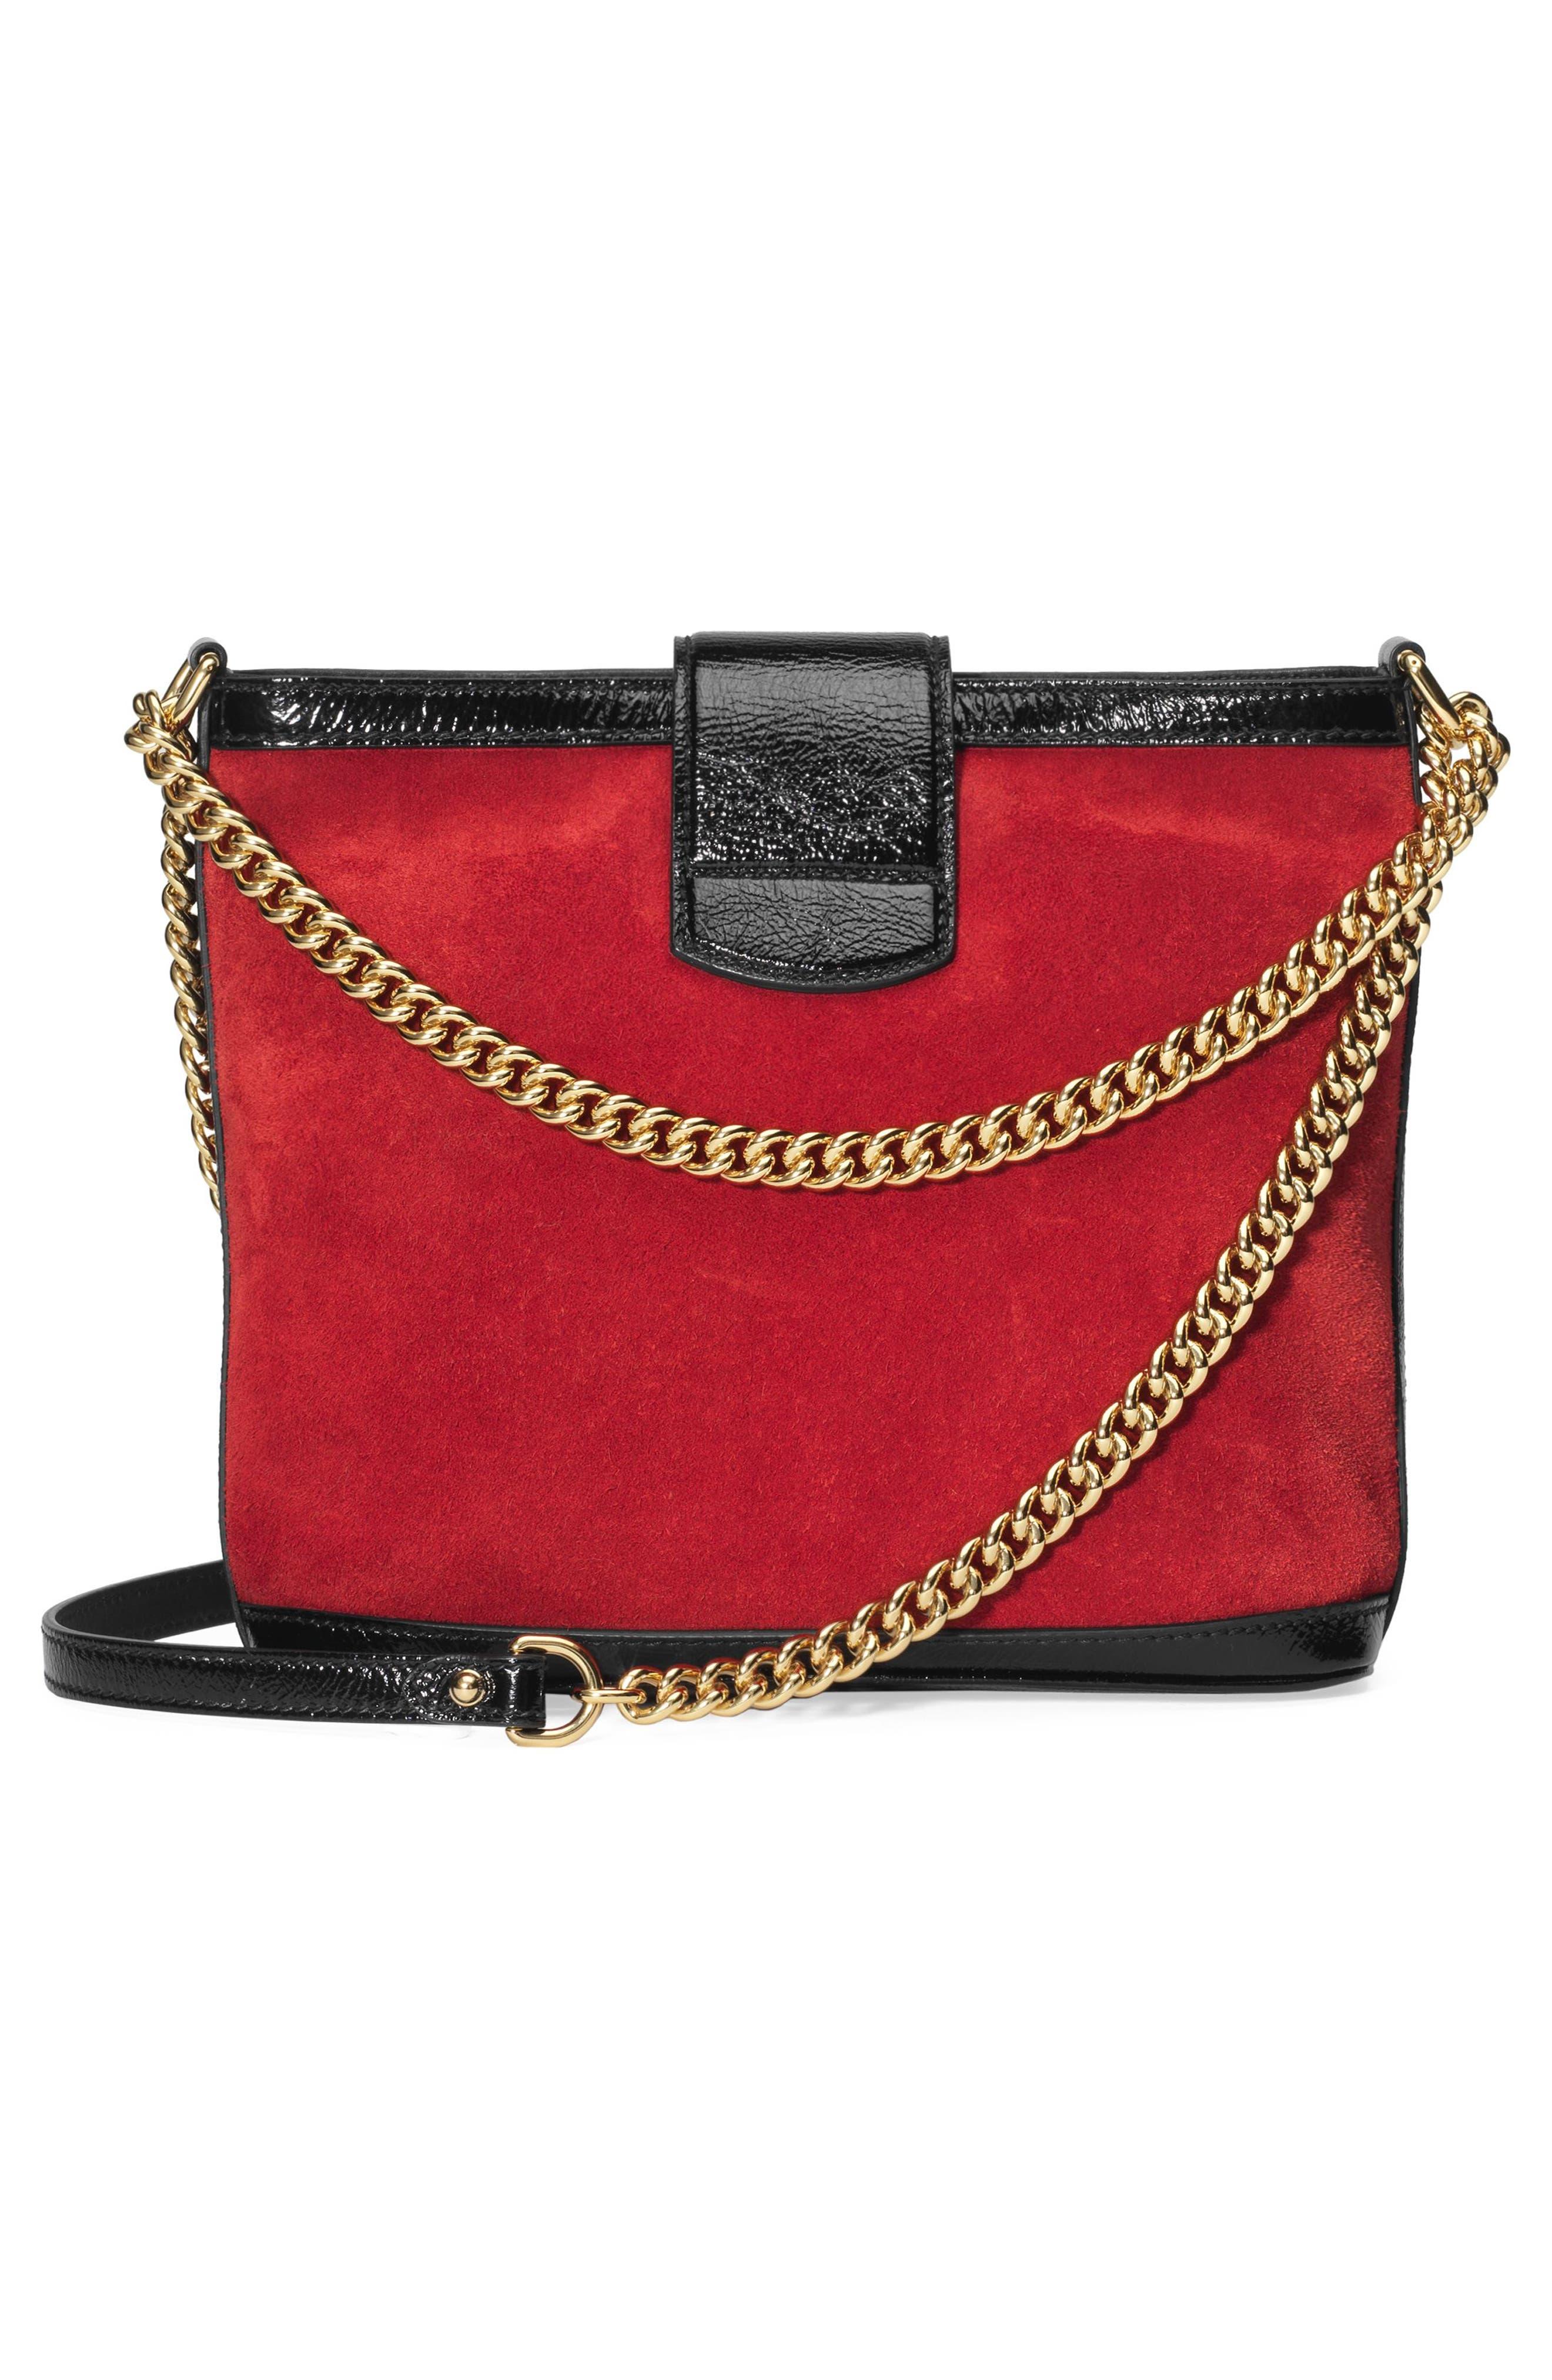 GUCCI,                             Medium Dionysus Suede Shoulder Bag,                             Alternate thumbnail 2, color,                             HIBISCUS RED/ NERO